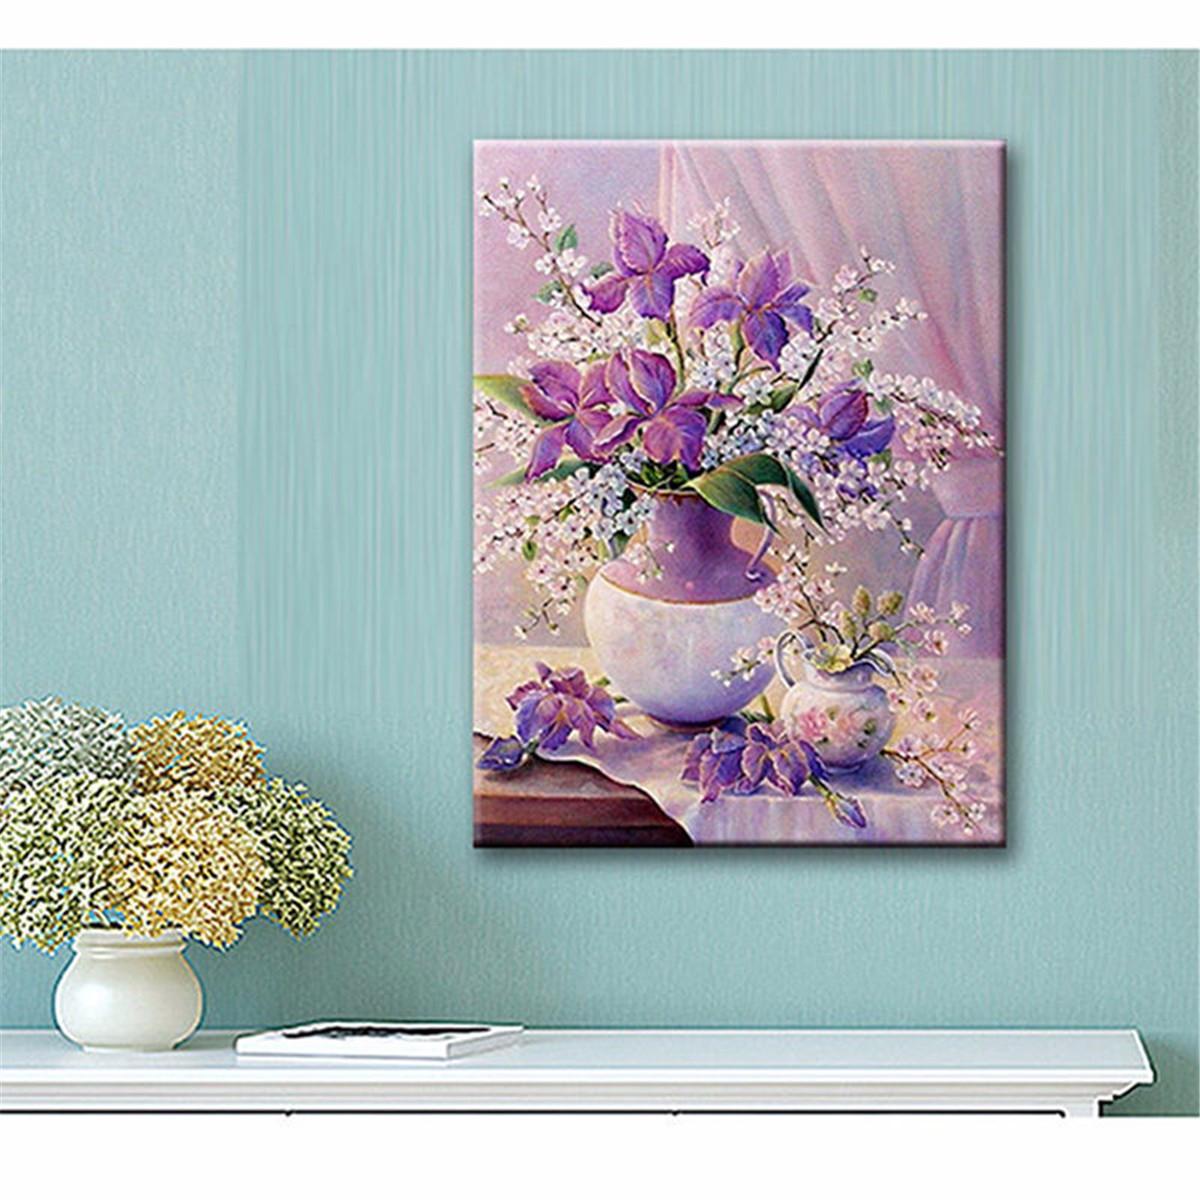 30x40CM 5D Diamond Painting DIY Purple Vase Flowers Cross ...